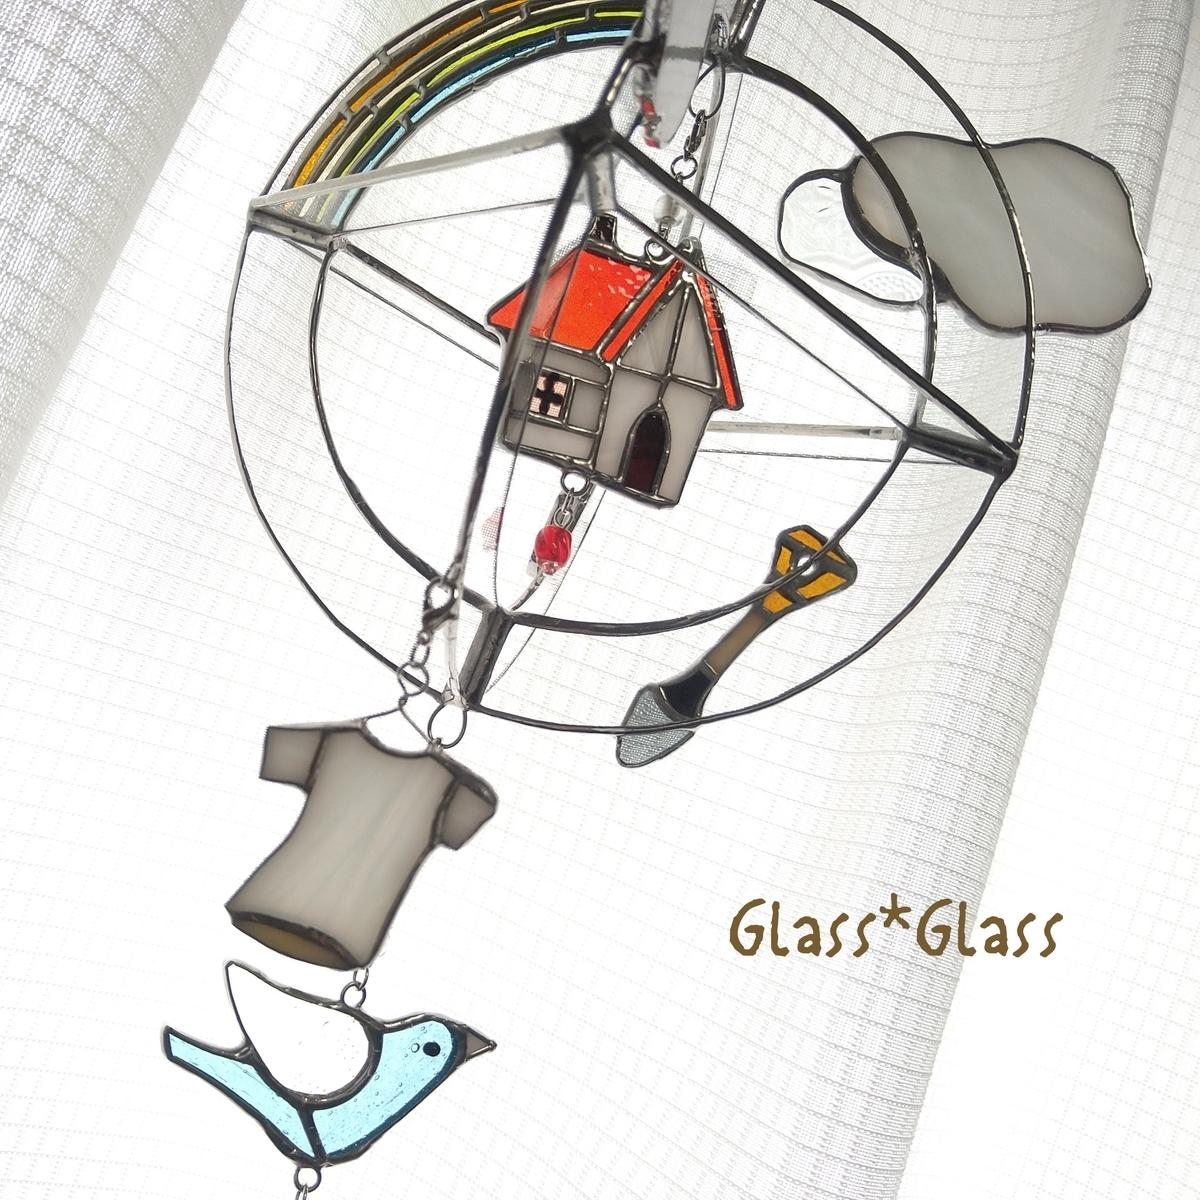 f:id:glassglassmegu:20210520153657j:plain